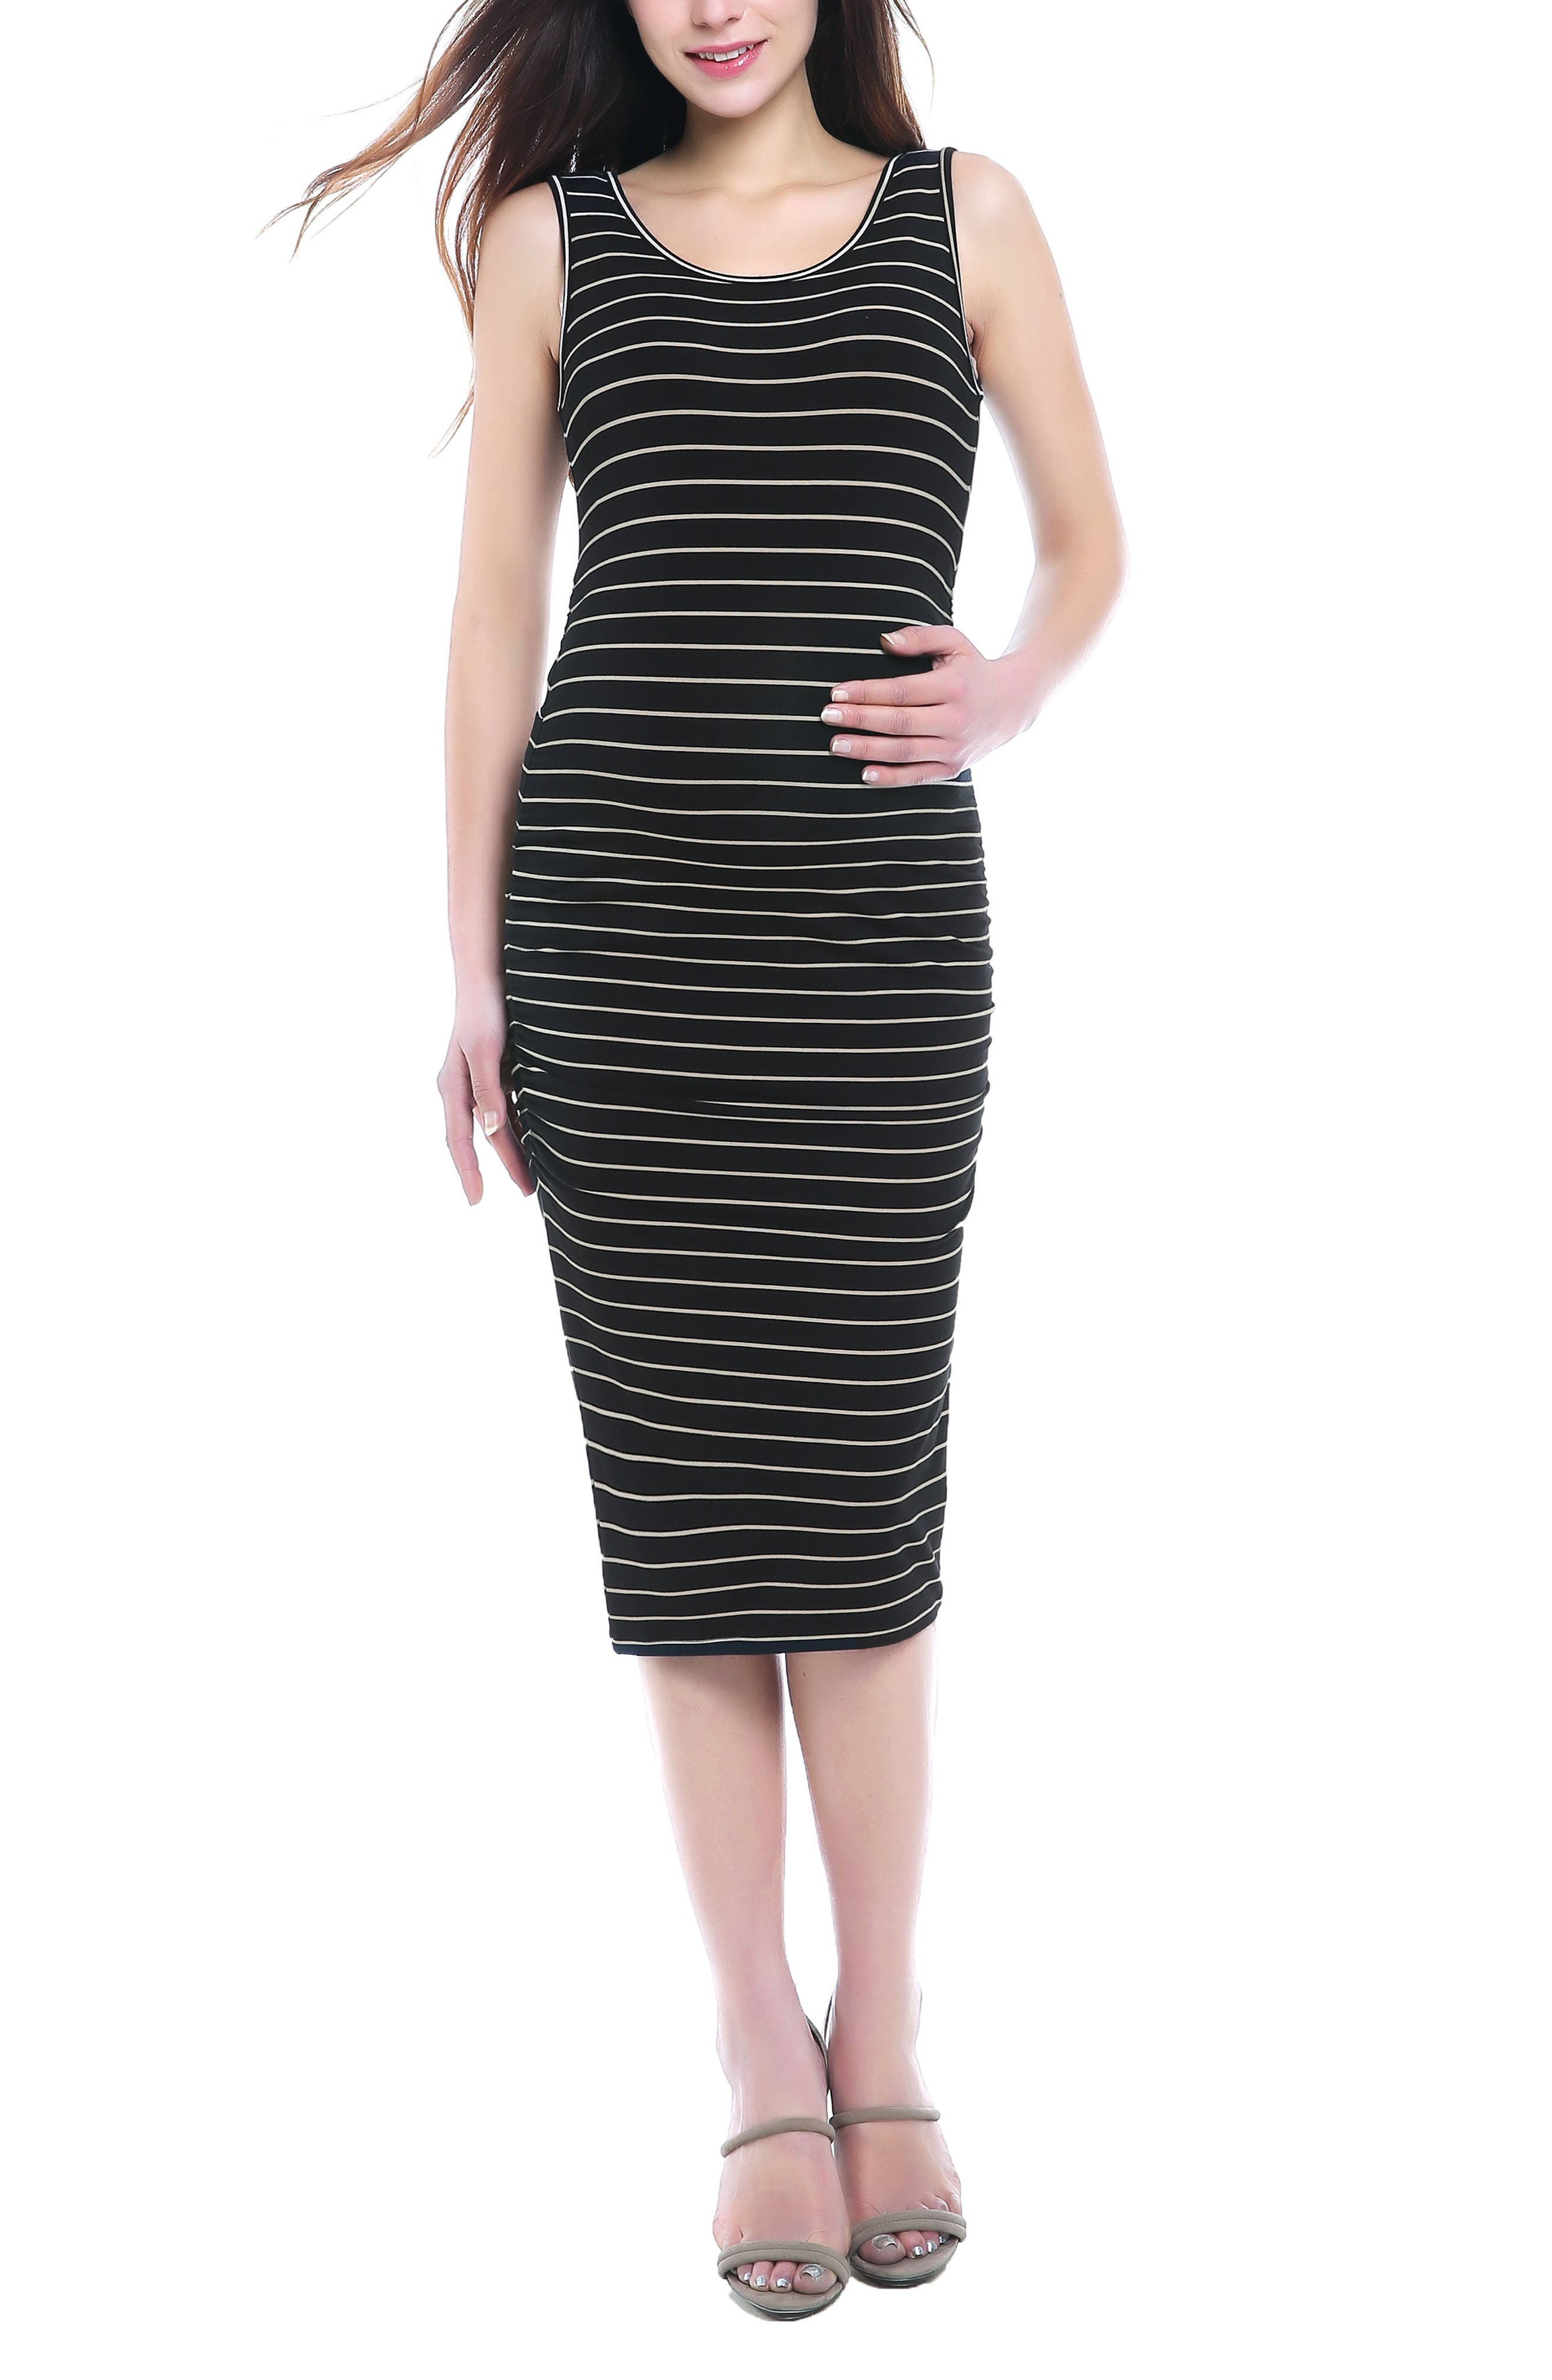 Kimi And Kai Tobi Stripe Maternity Dress, Black